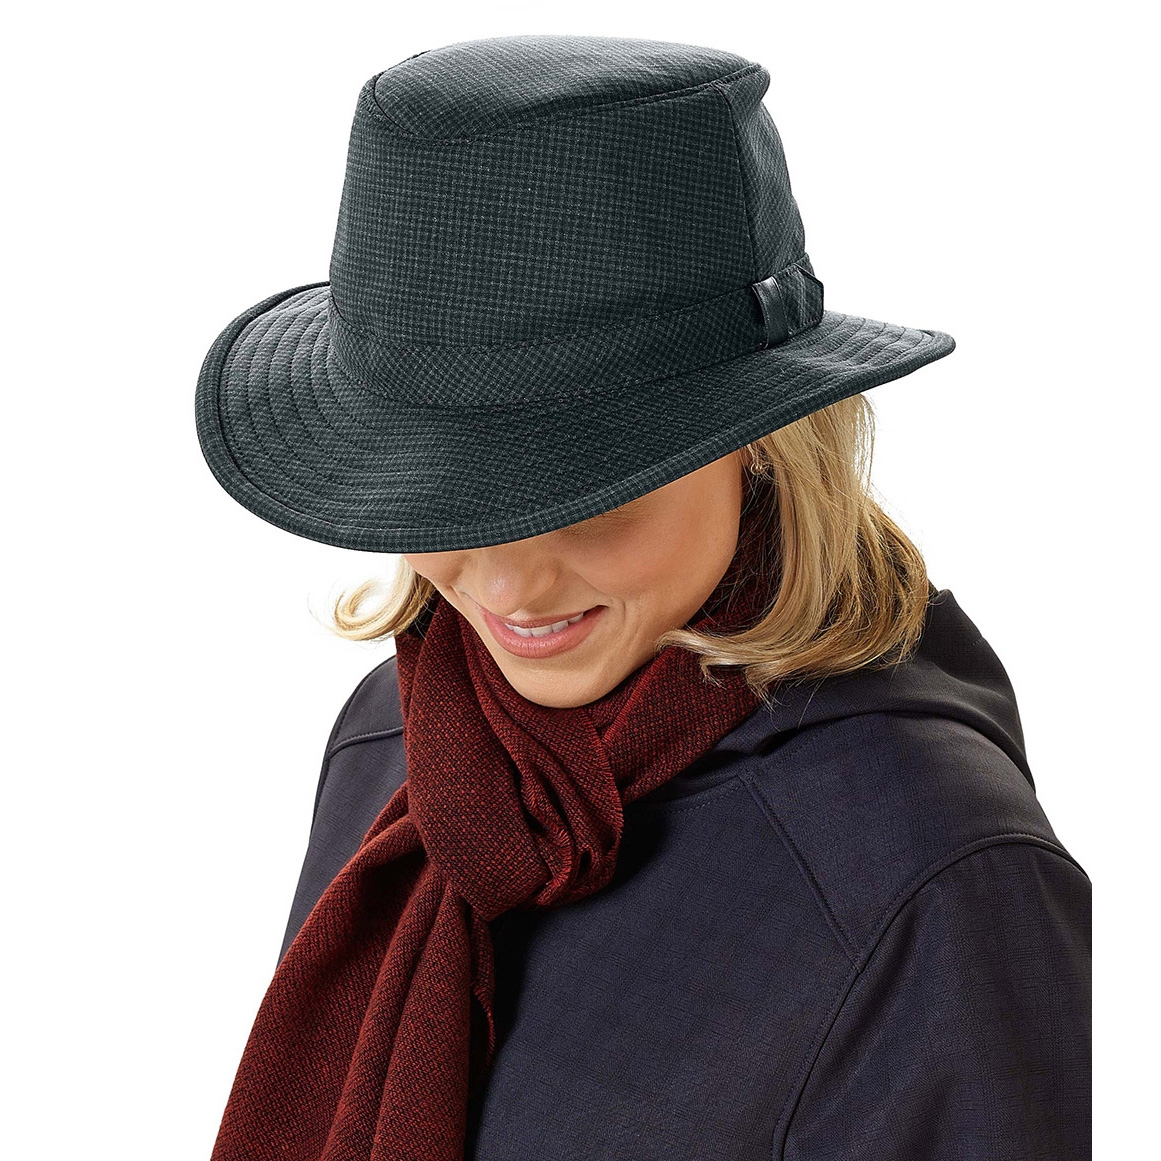 67581229 ... Image of Tilley Medium Curved Brim Tec Cork Winter Hat - Black / Grey  ...